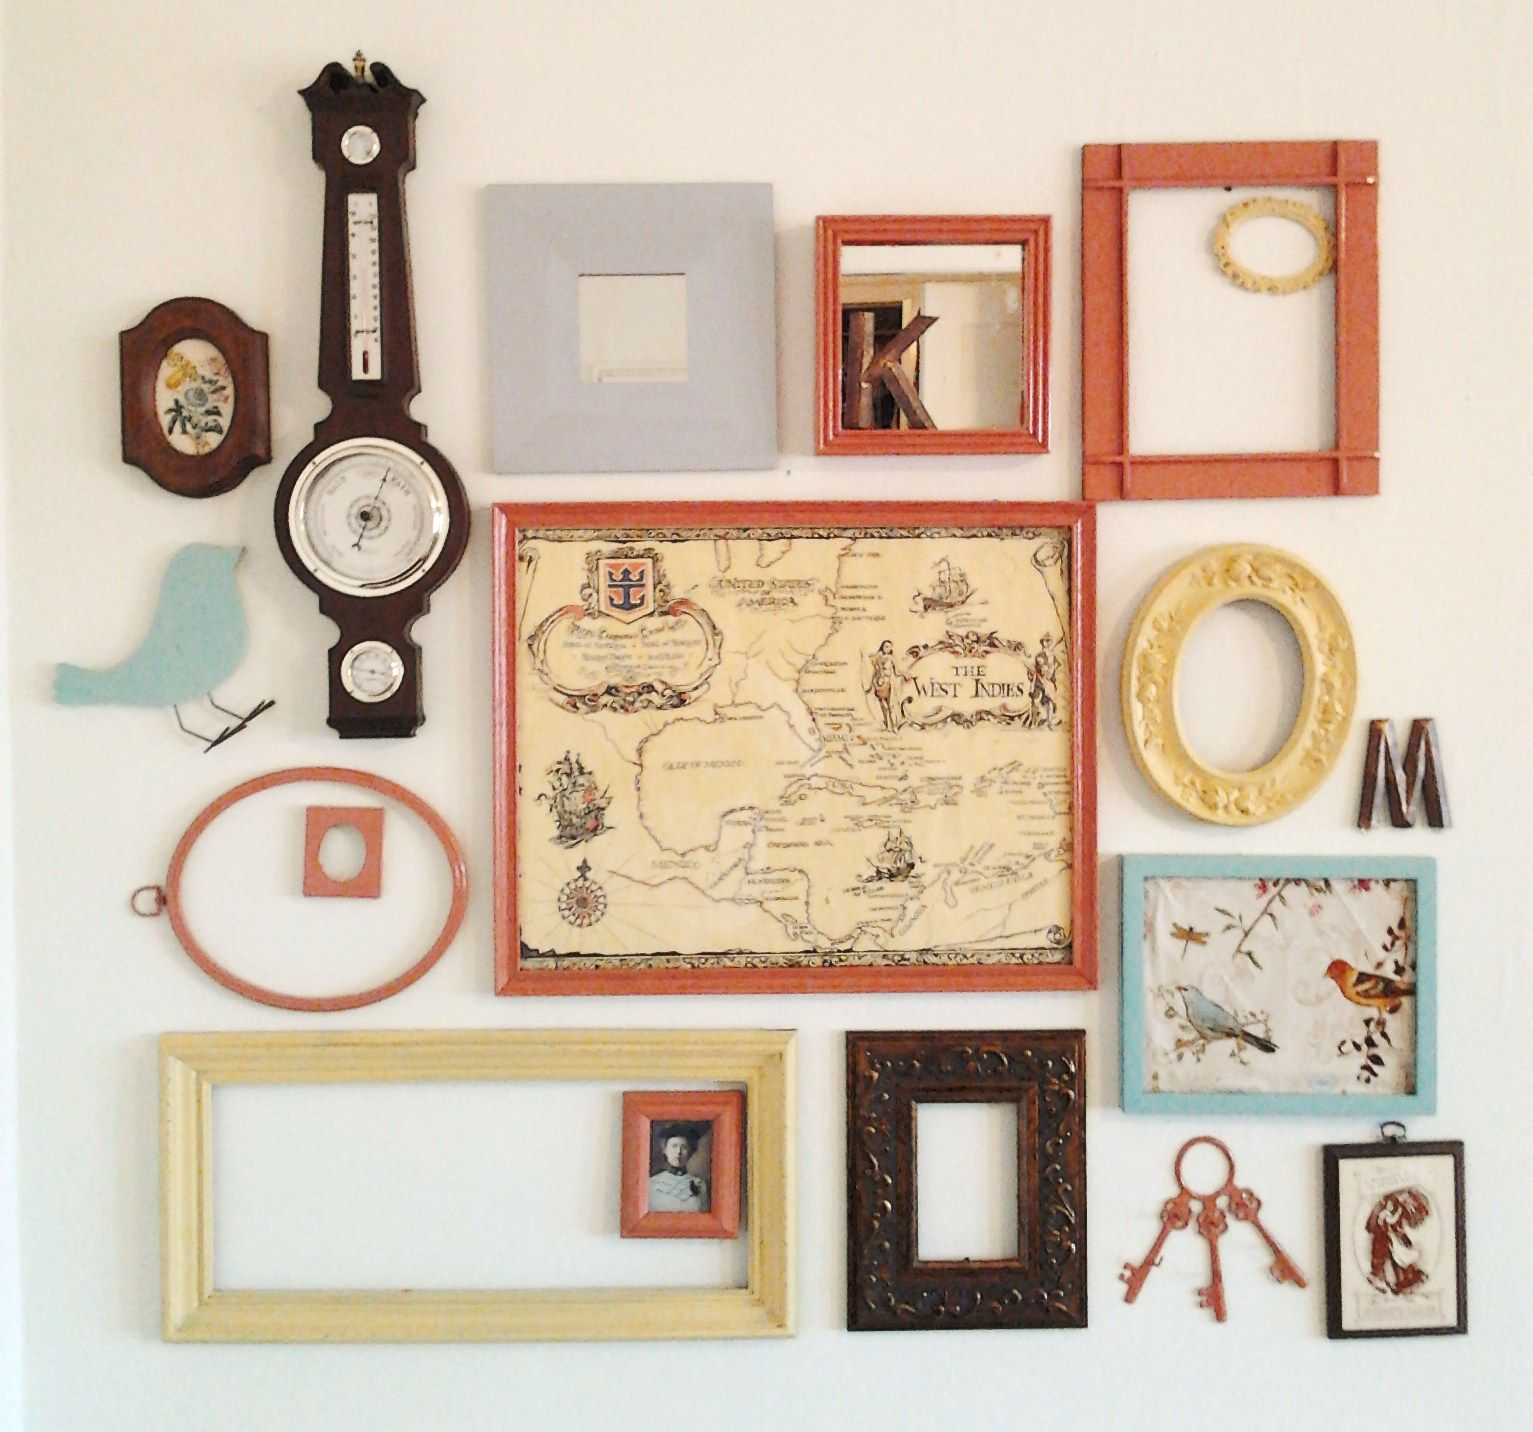 Picture frame wall display/ DIY headboard | DIY.E.S! | Pinterest ...